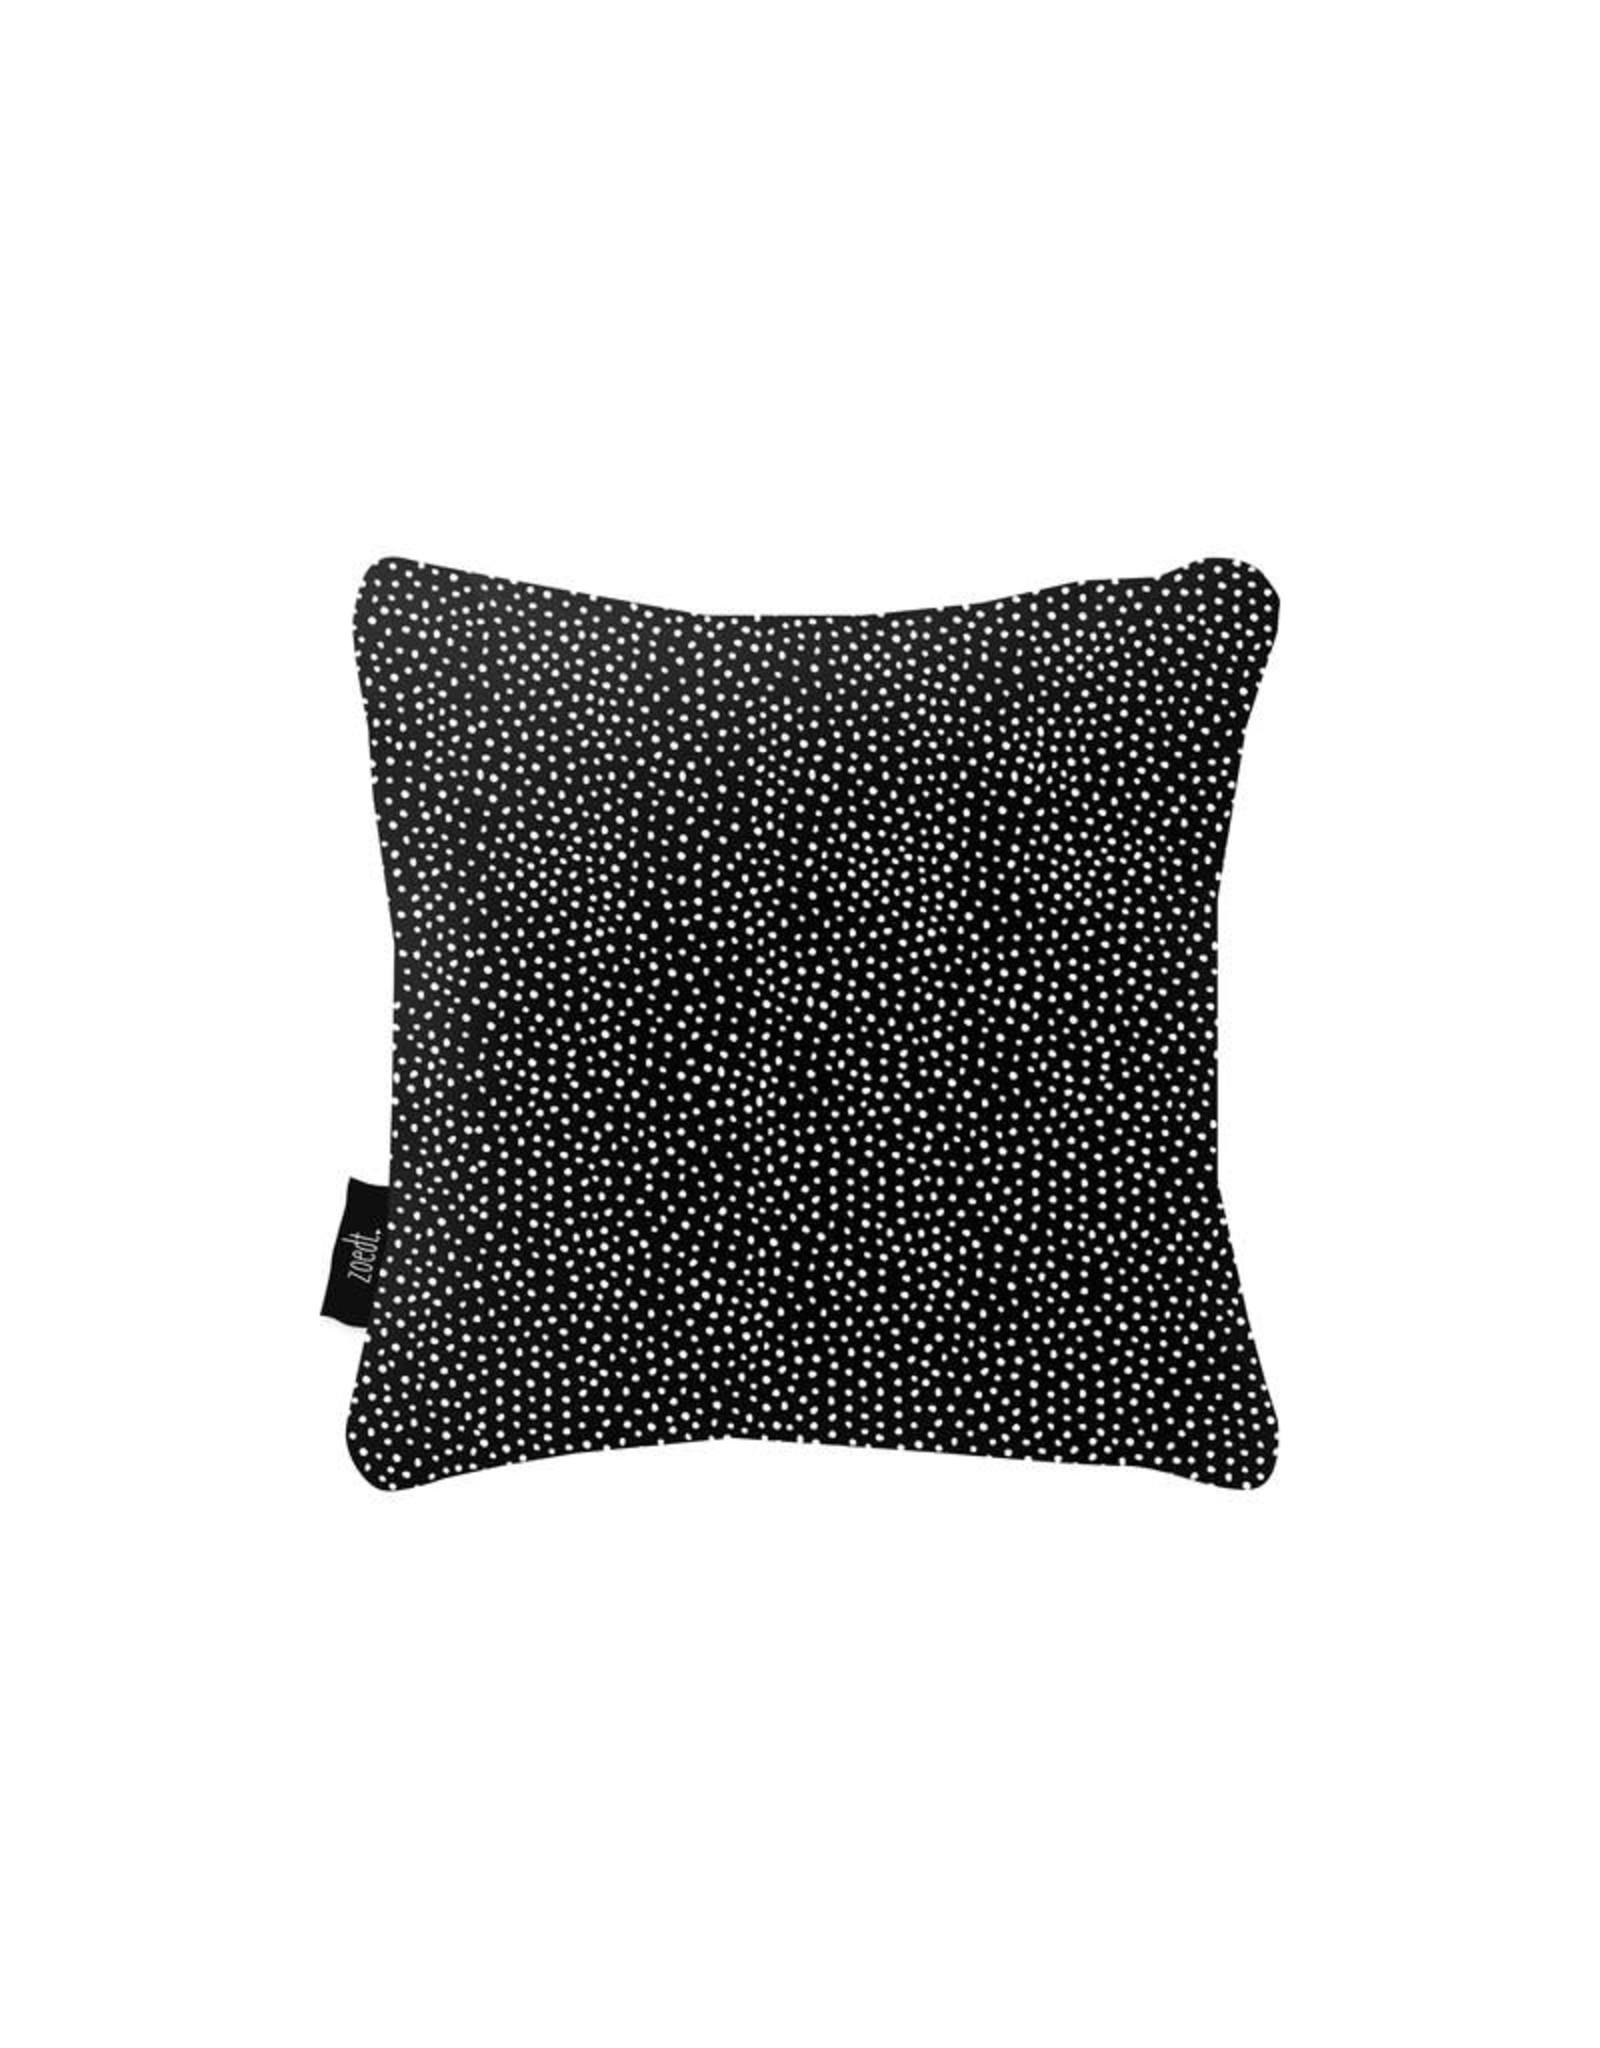 Buitenkussen 'Hart' zwart vierkant